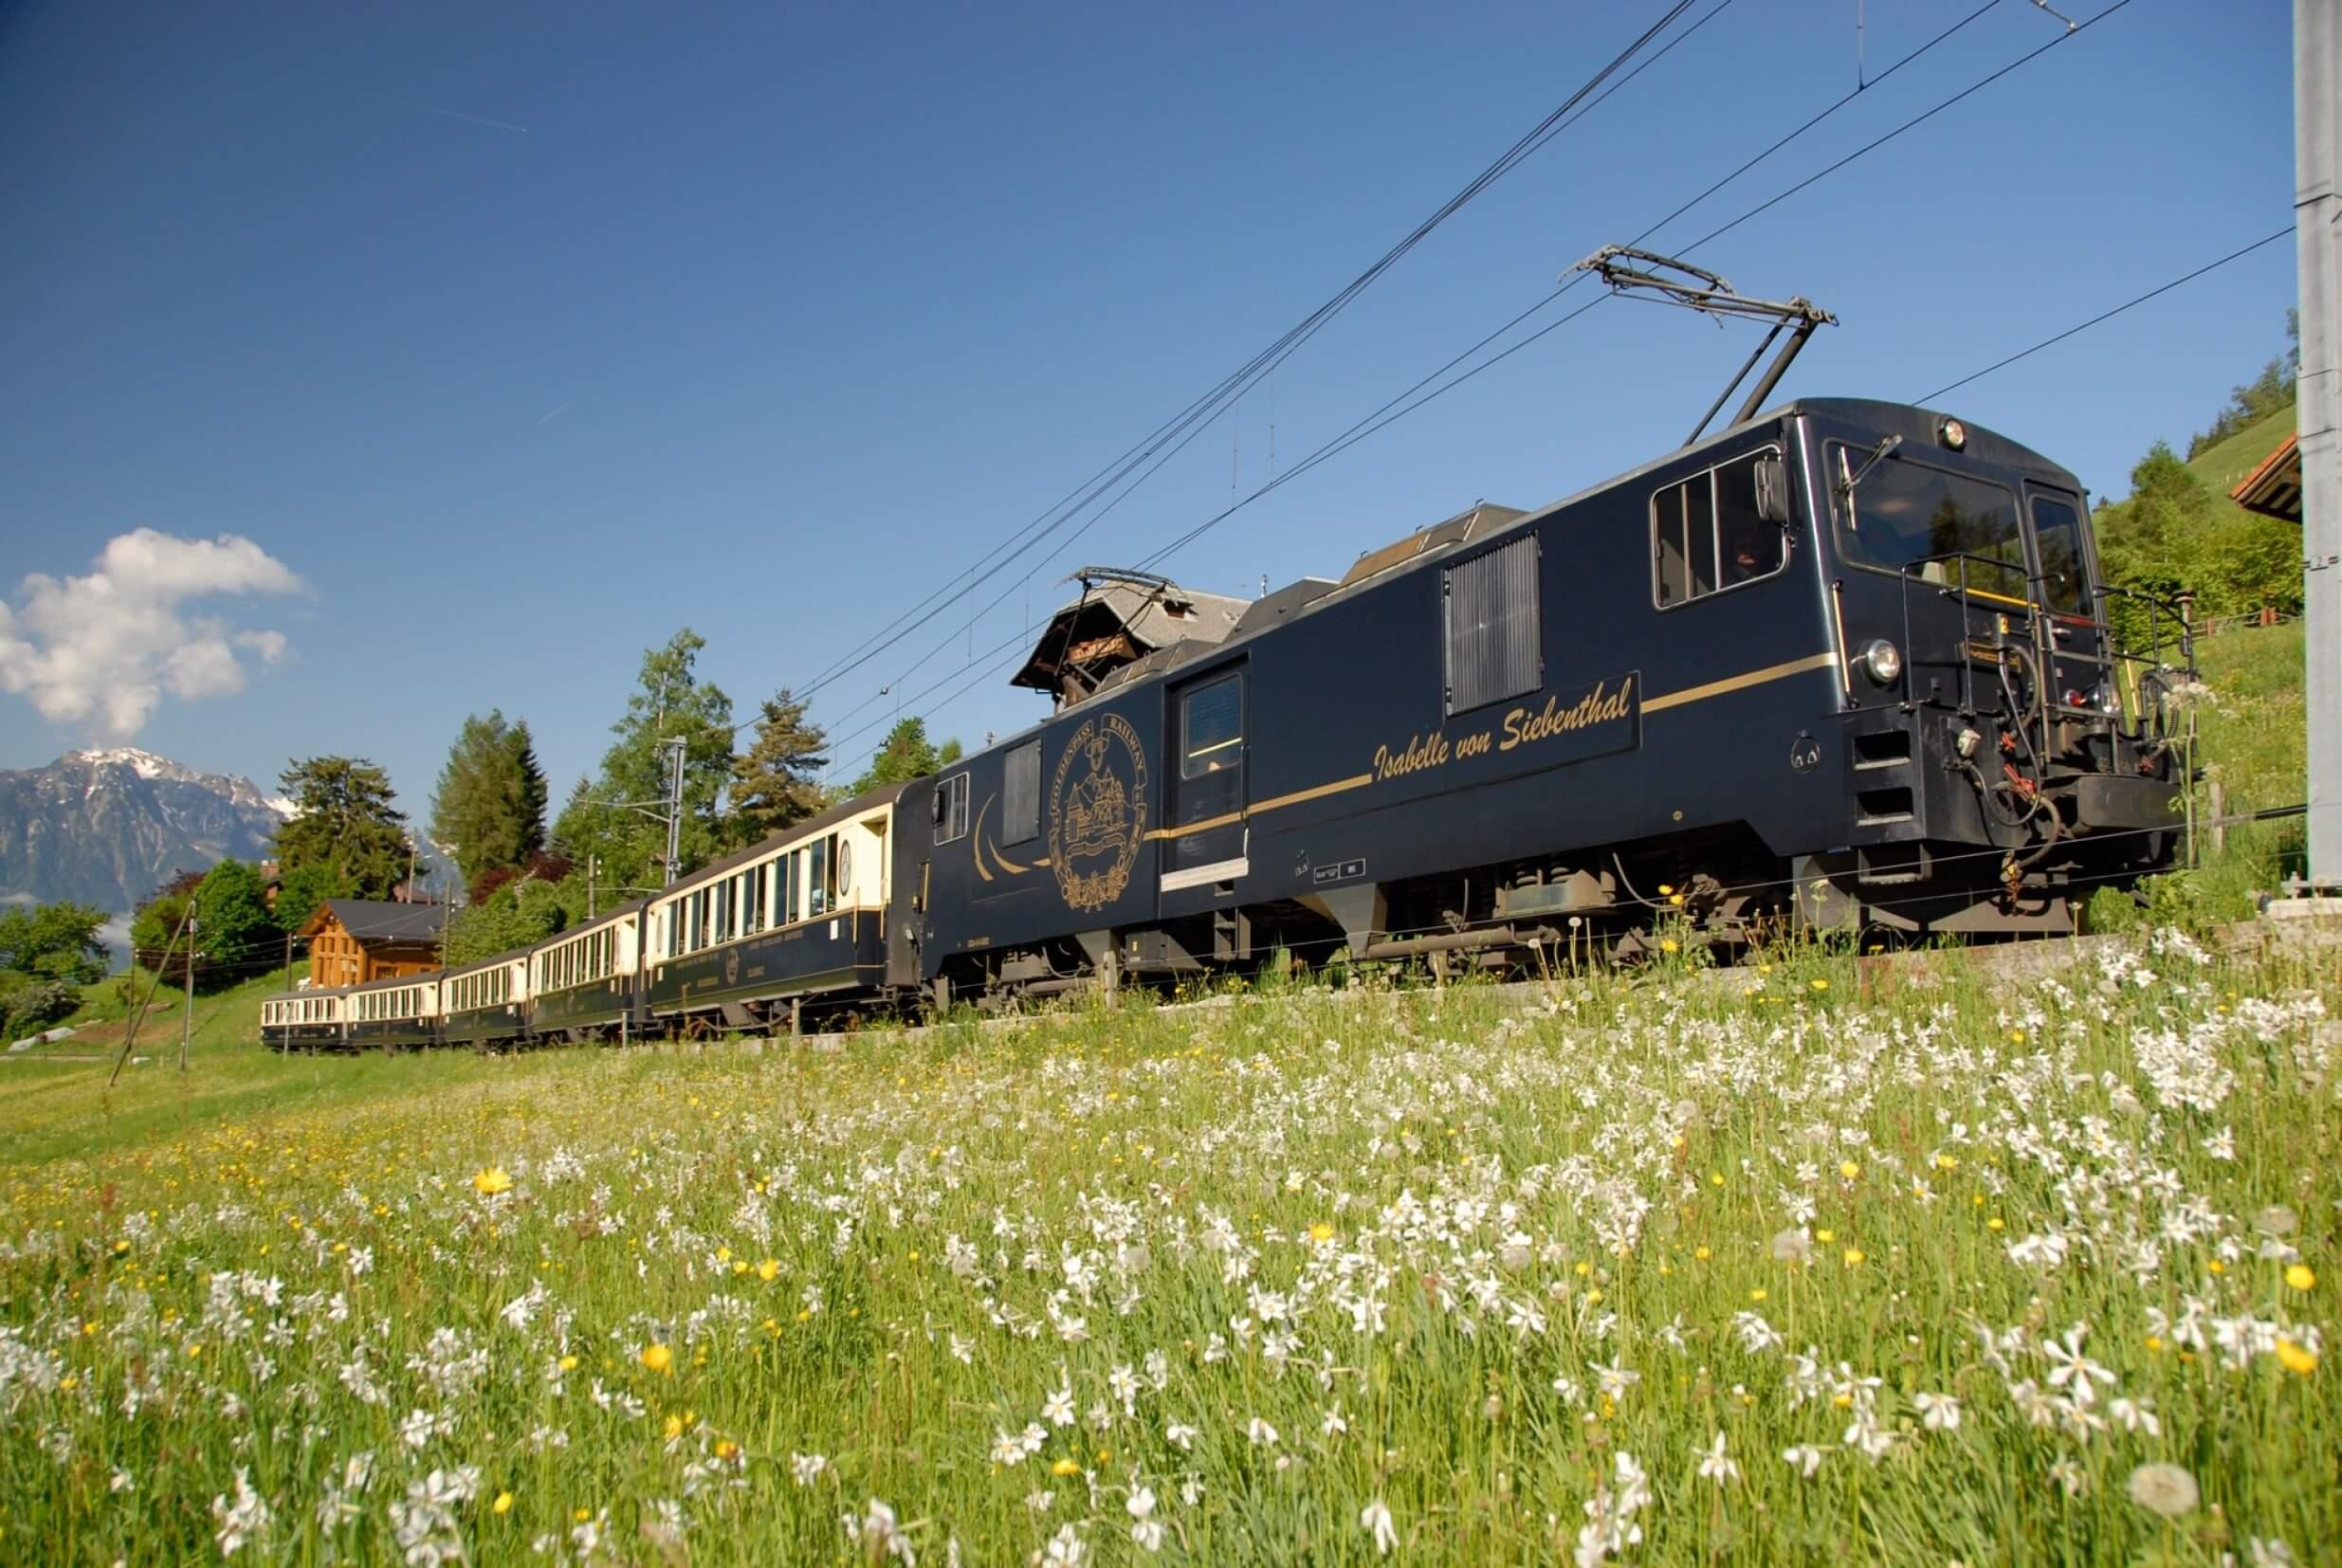 goldenpass-zug-sommer-classic-nostalgie